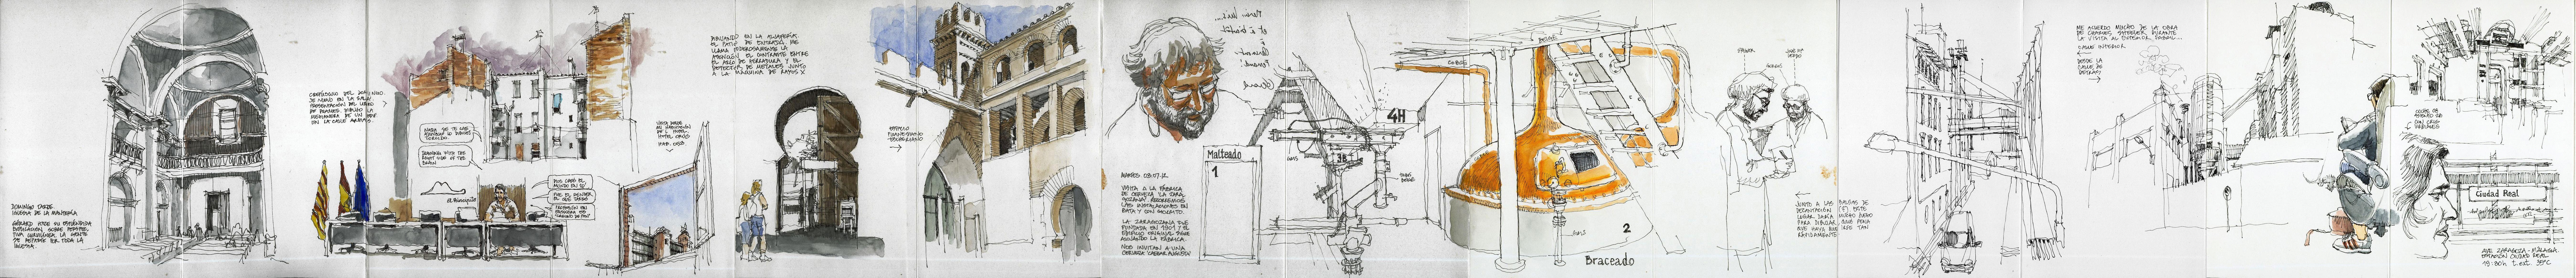 cuaderno de zaragoza 2